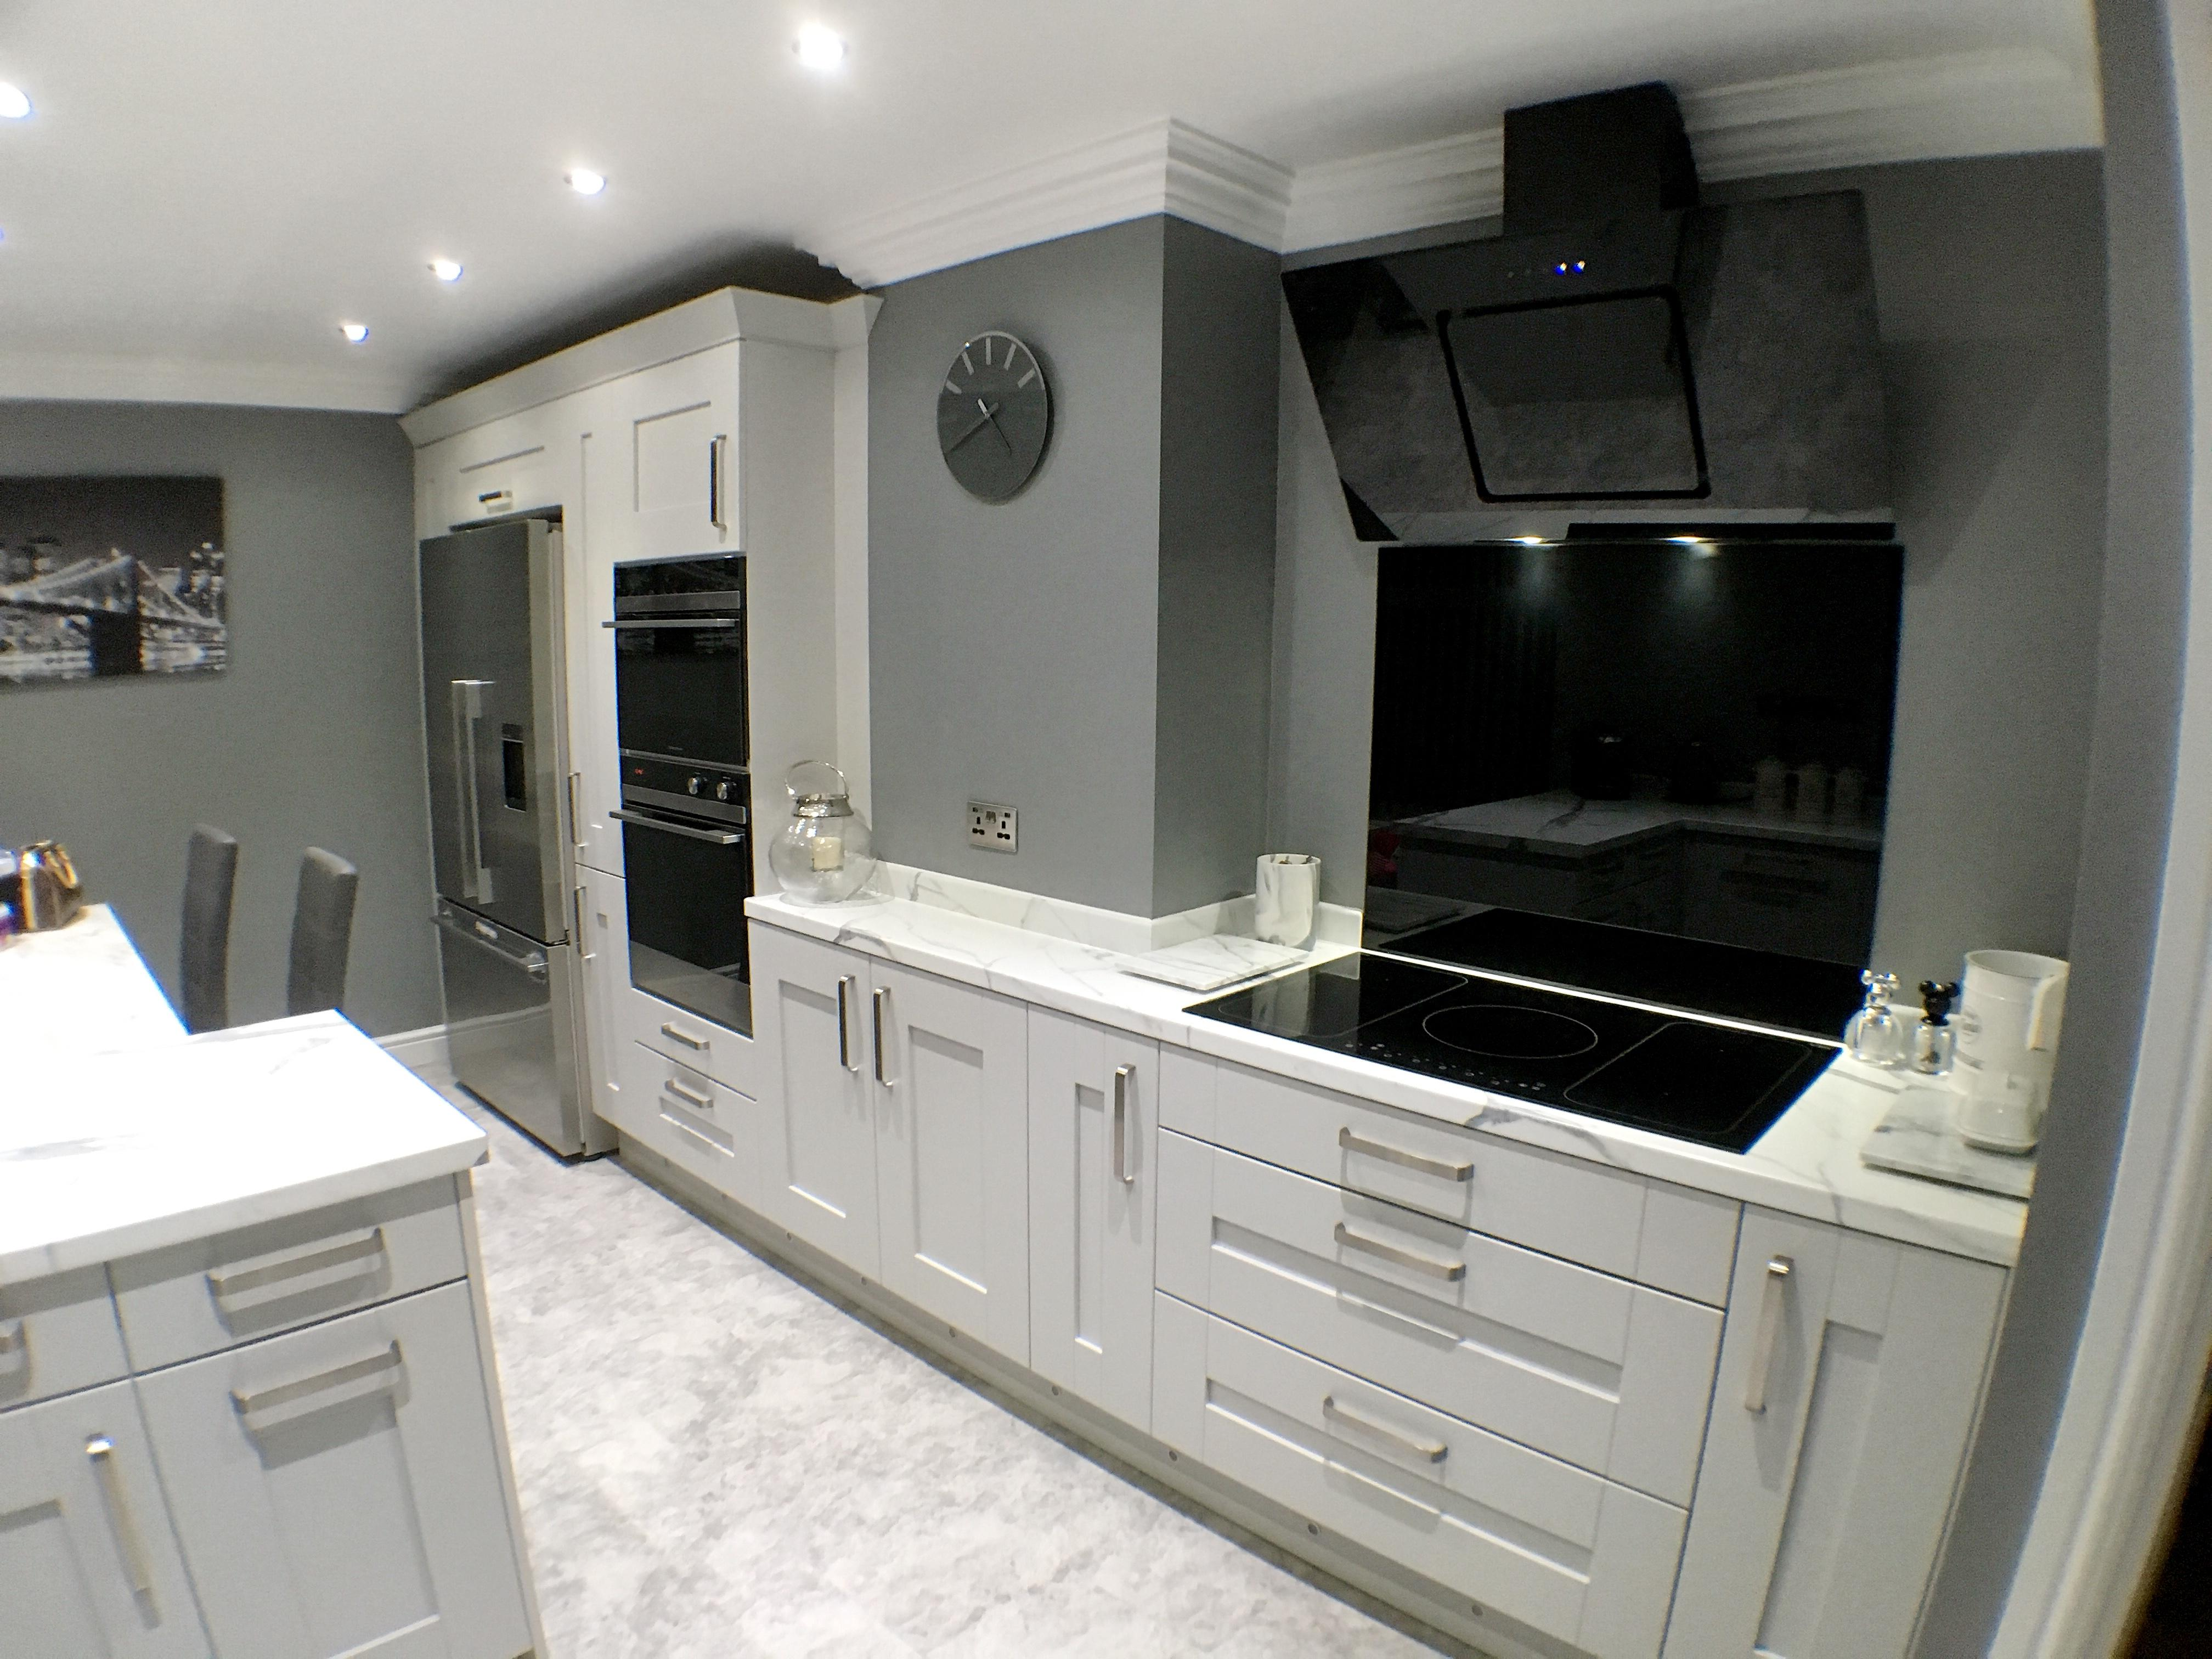 Portland Dove Grey - Dove grey kitchen units